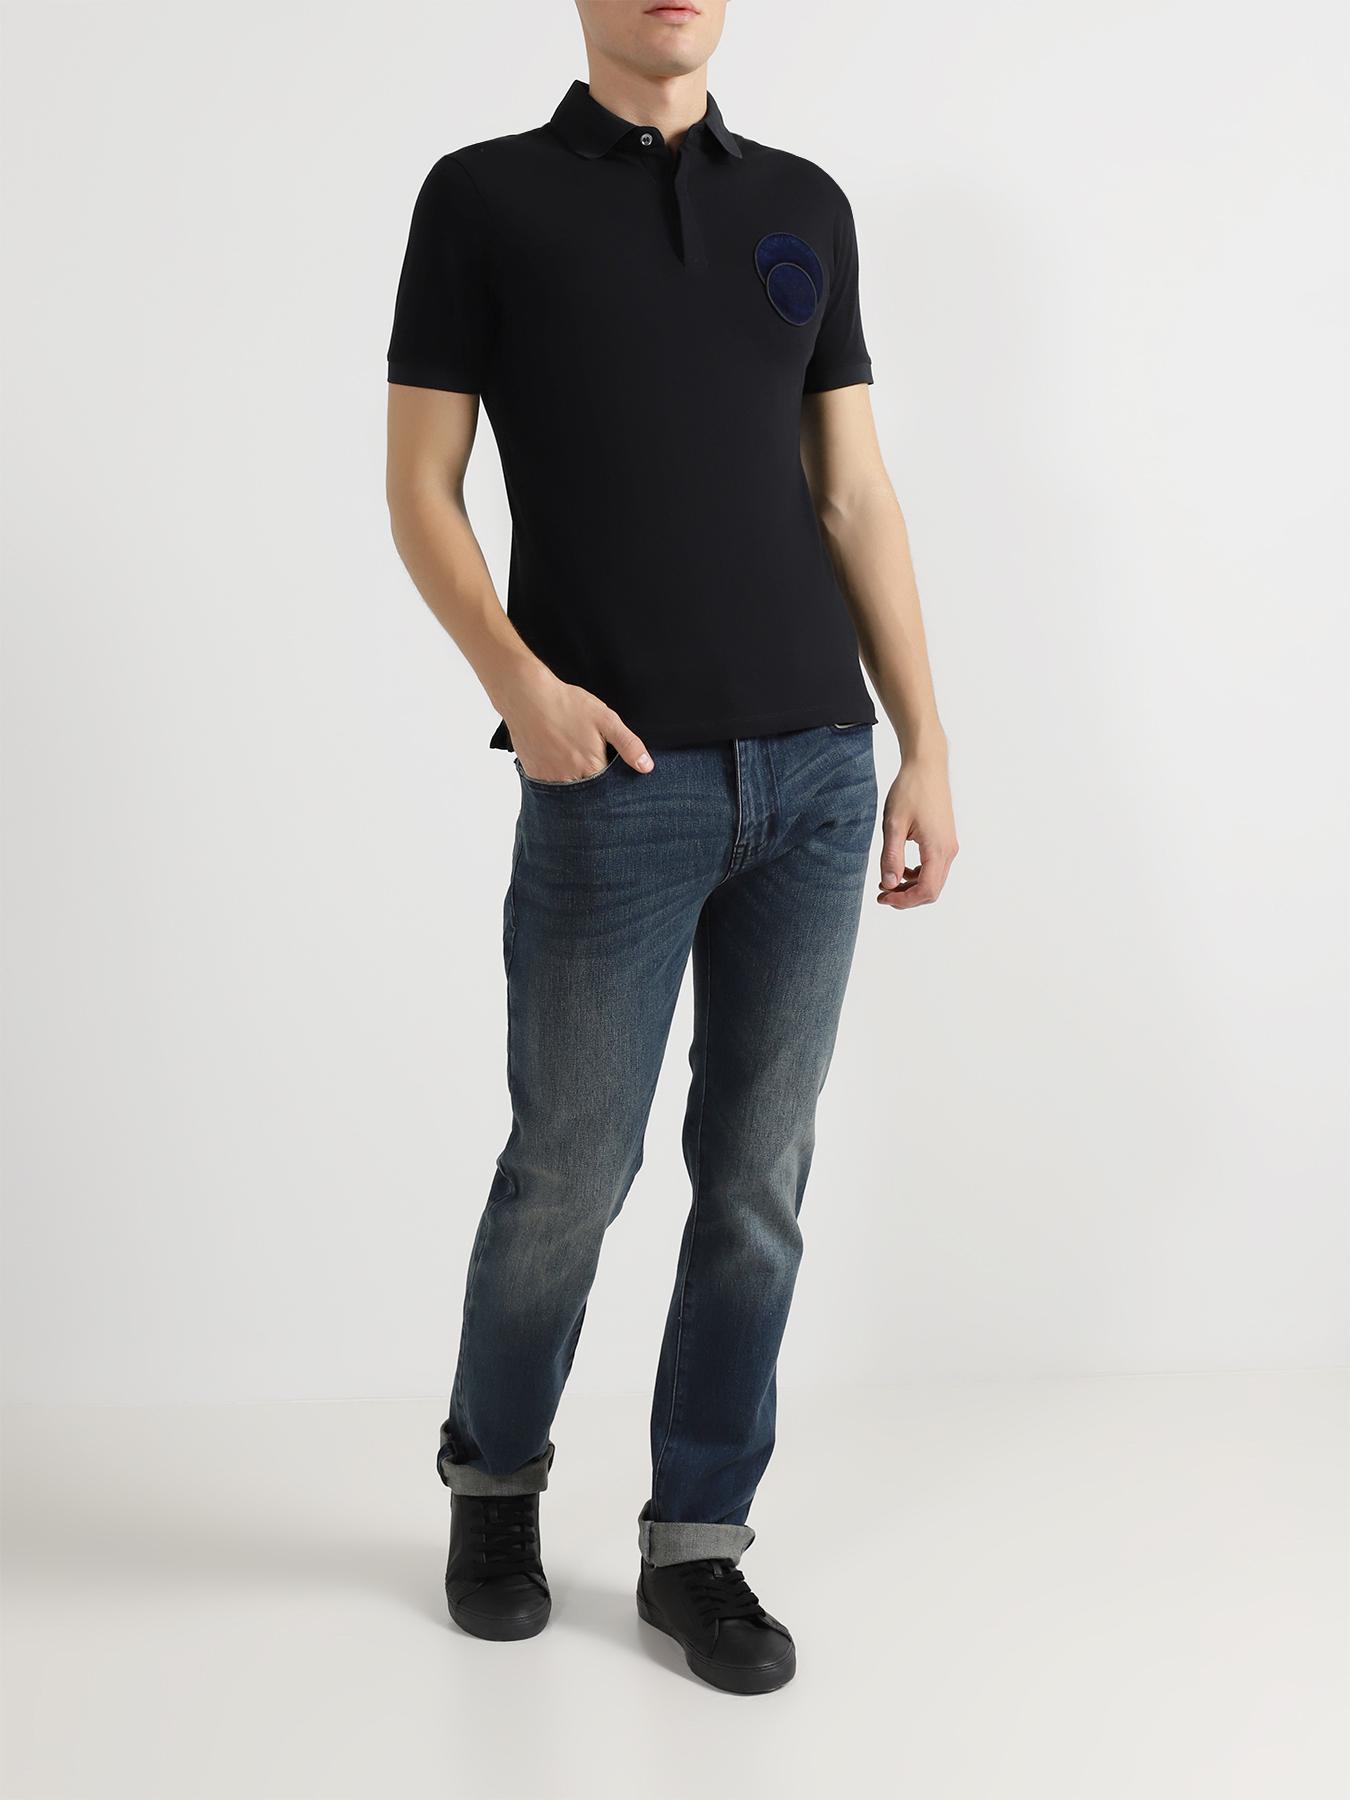 цена на Рубашка поло Emporio Armani Поло